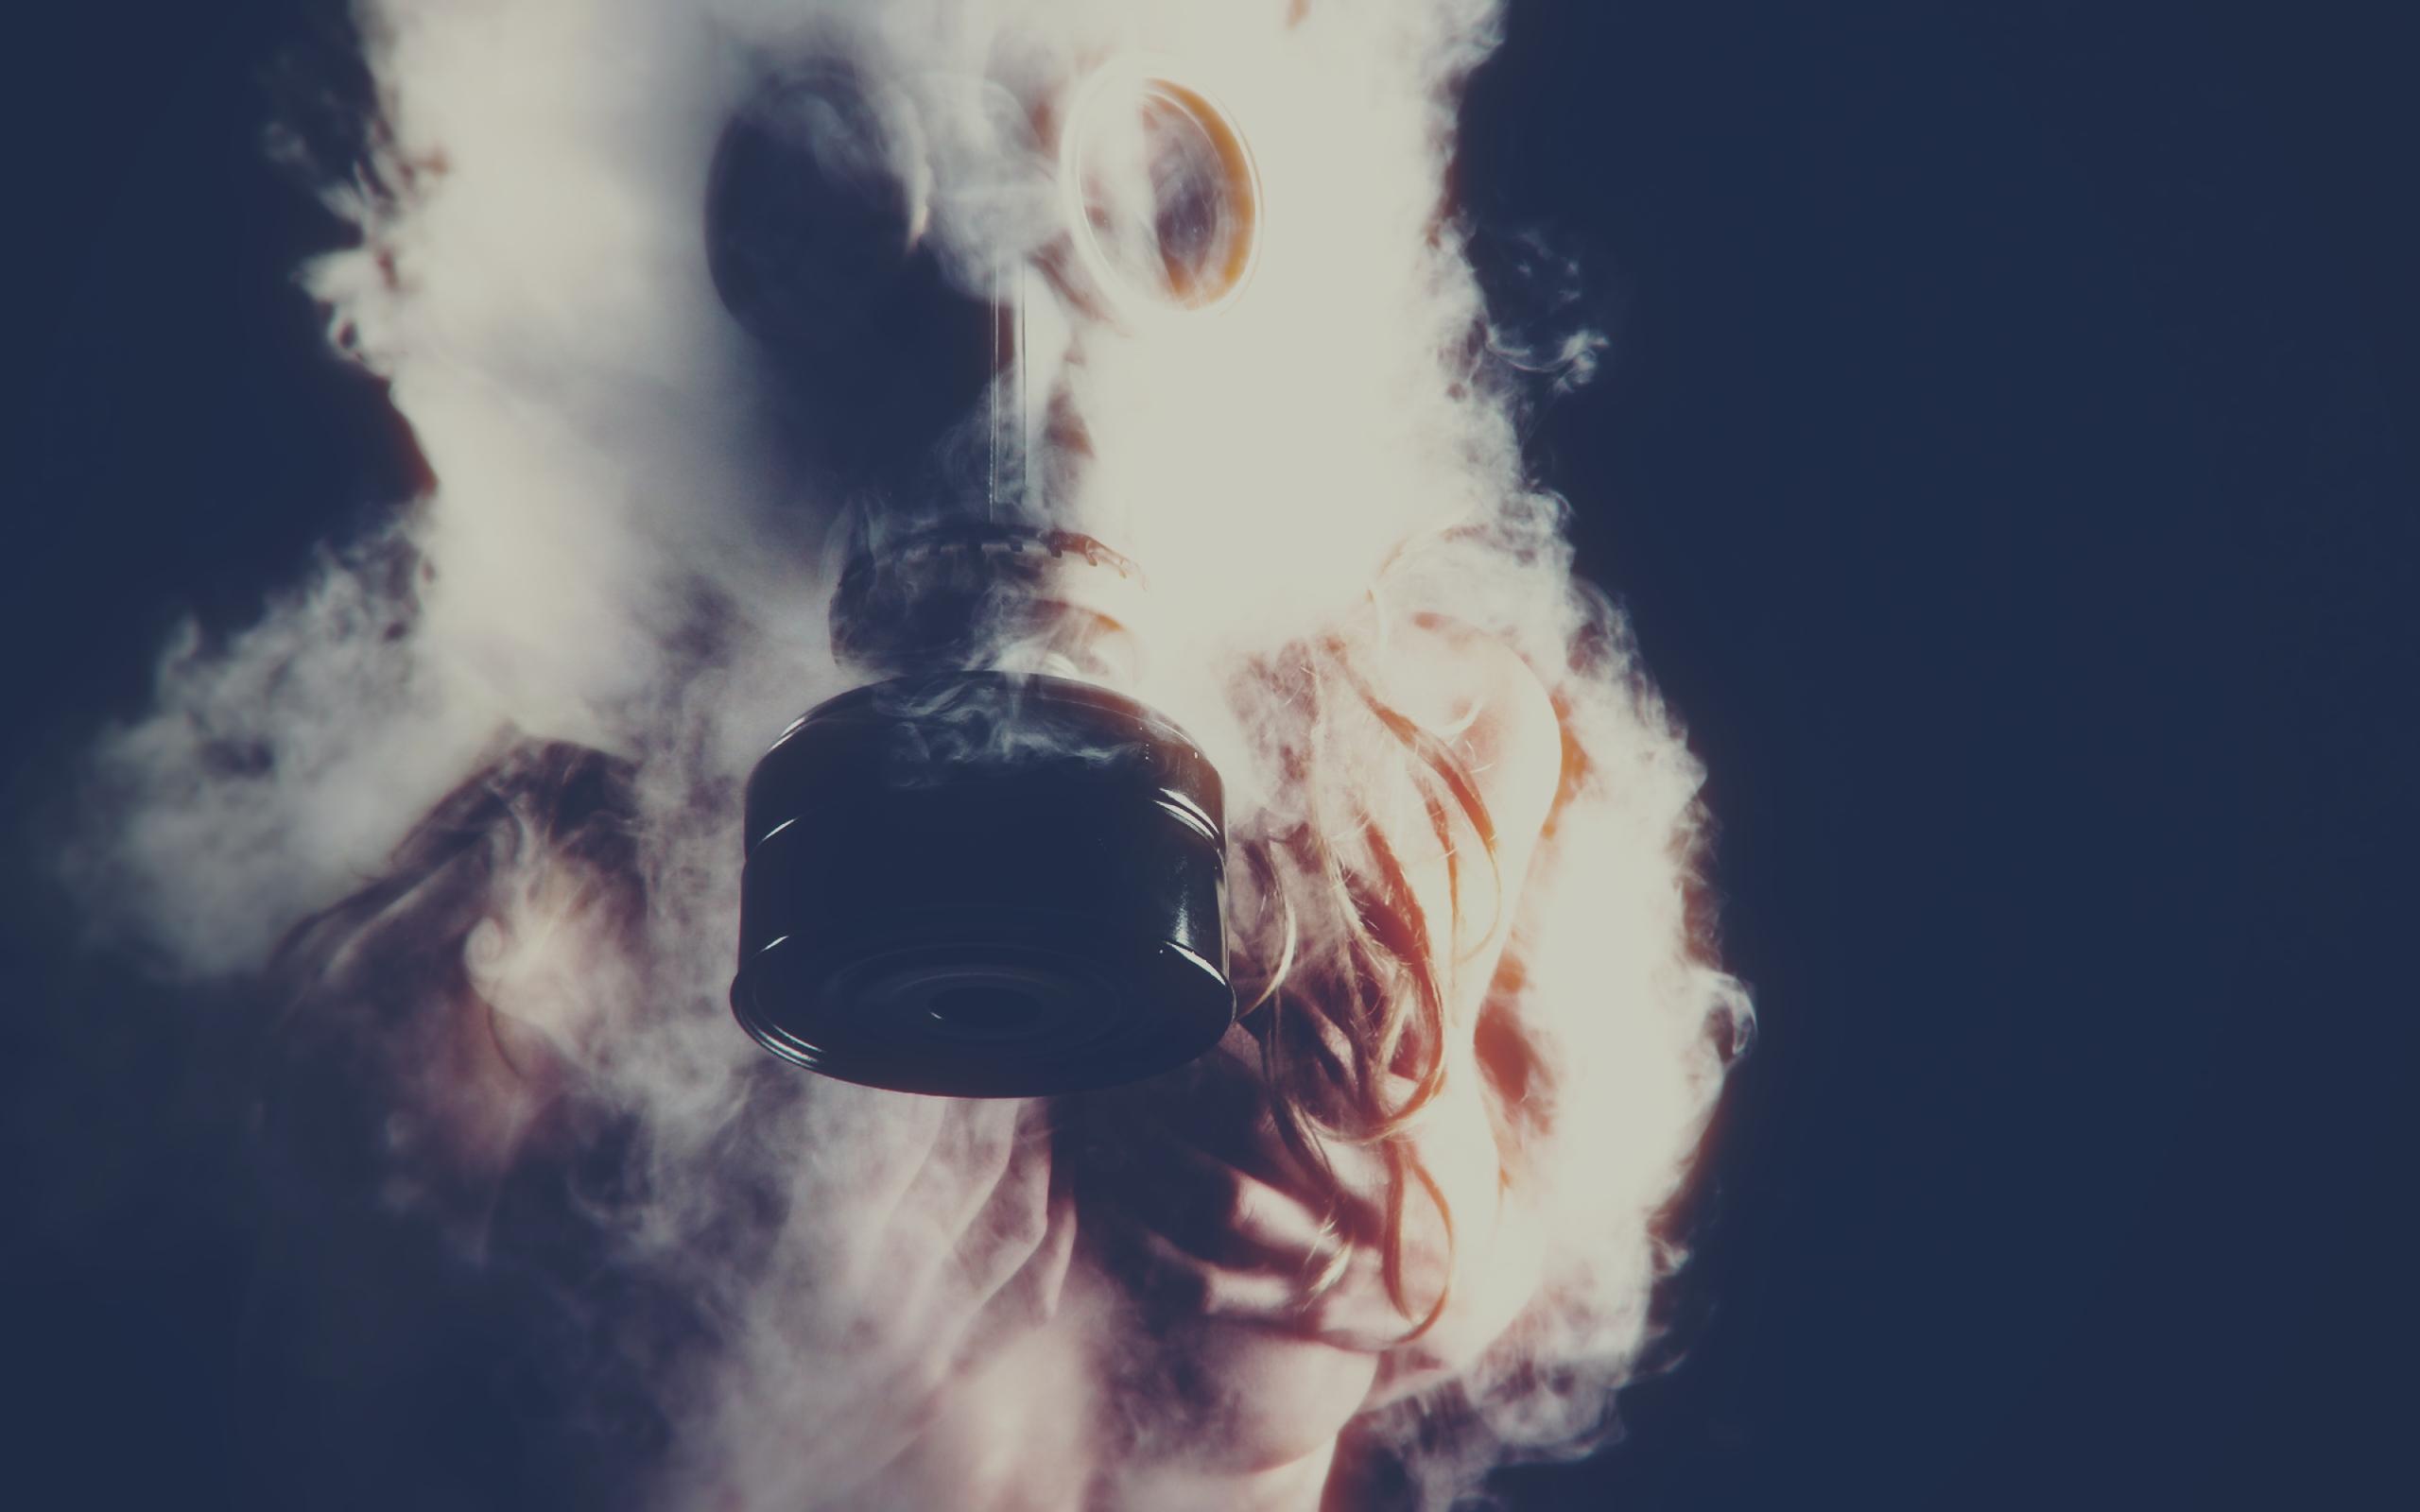 wallpaper : women, dark, gas masks, sky, smoke, blue, color, cloud